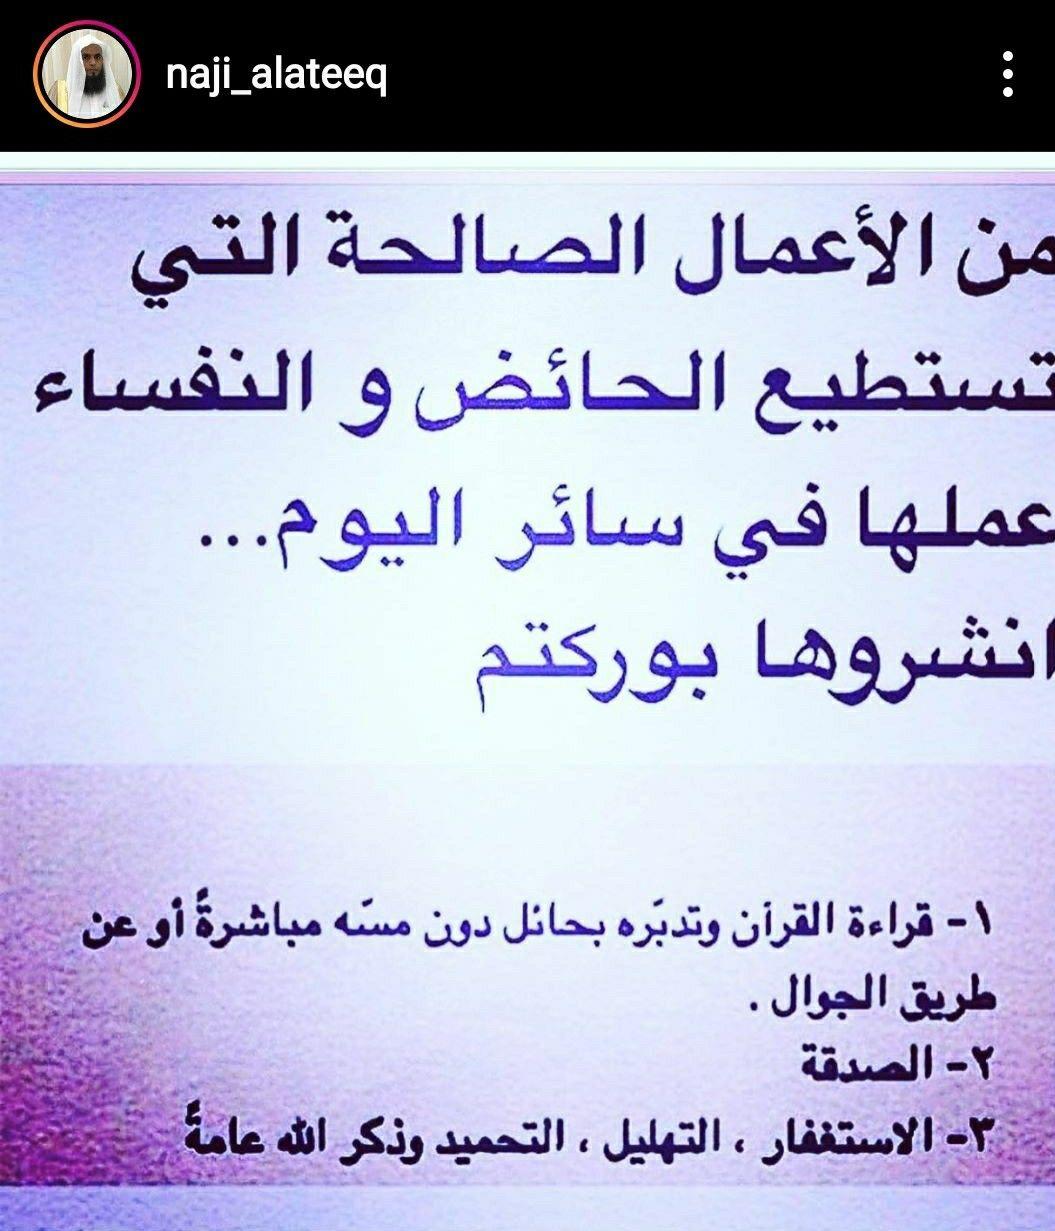 Pin By الشيخ أبو همام On G Raba Math Calligraphy Math Equations